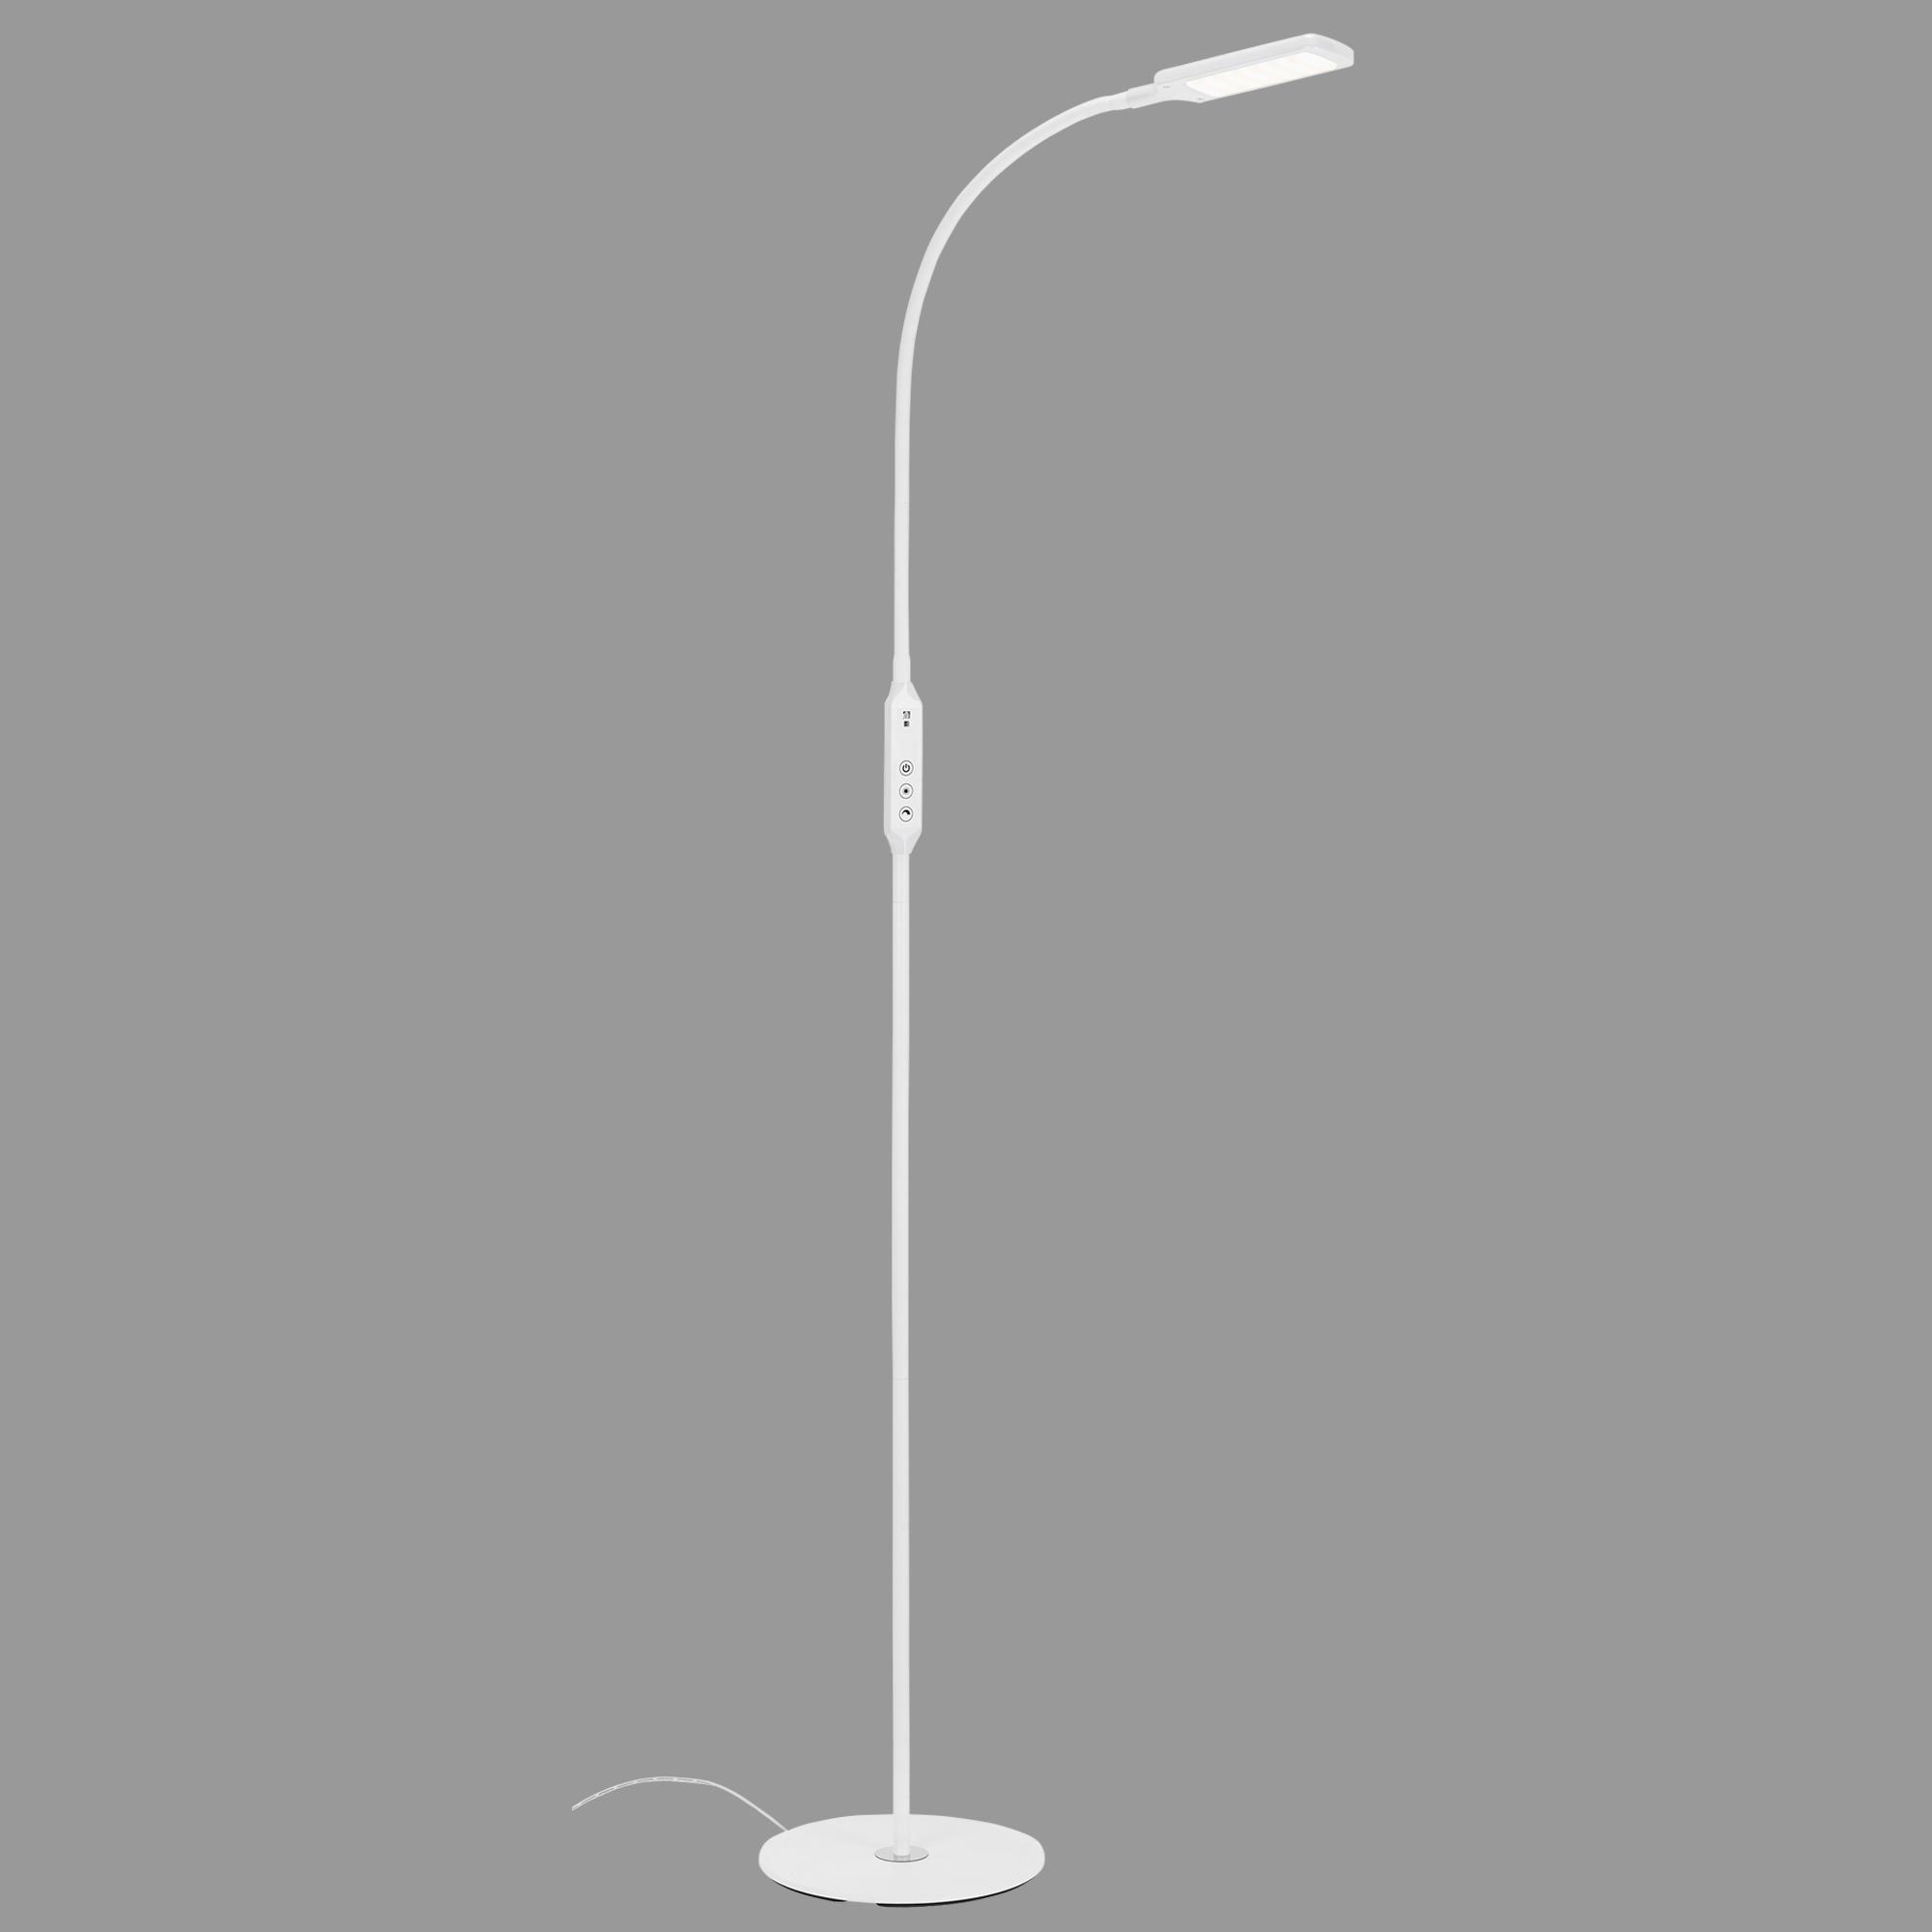 CCT LED Stehleuchte, 140 cm, 8 W, Weiss